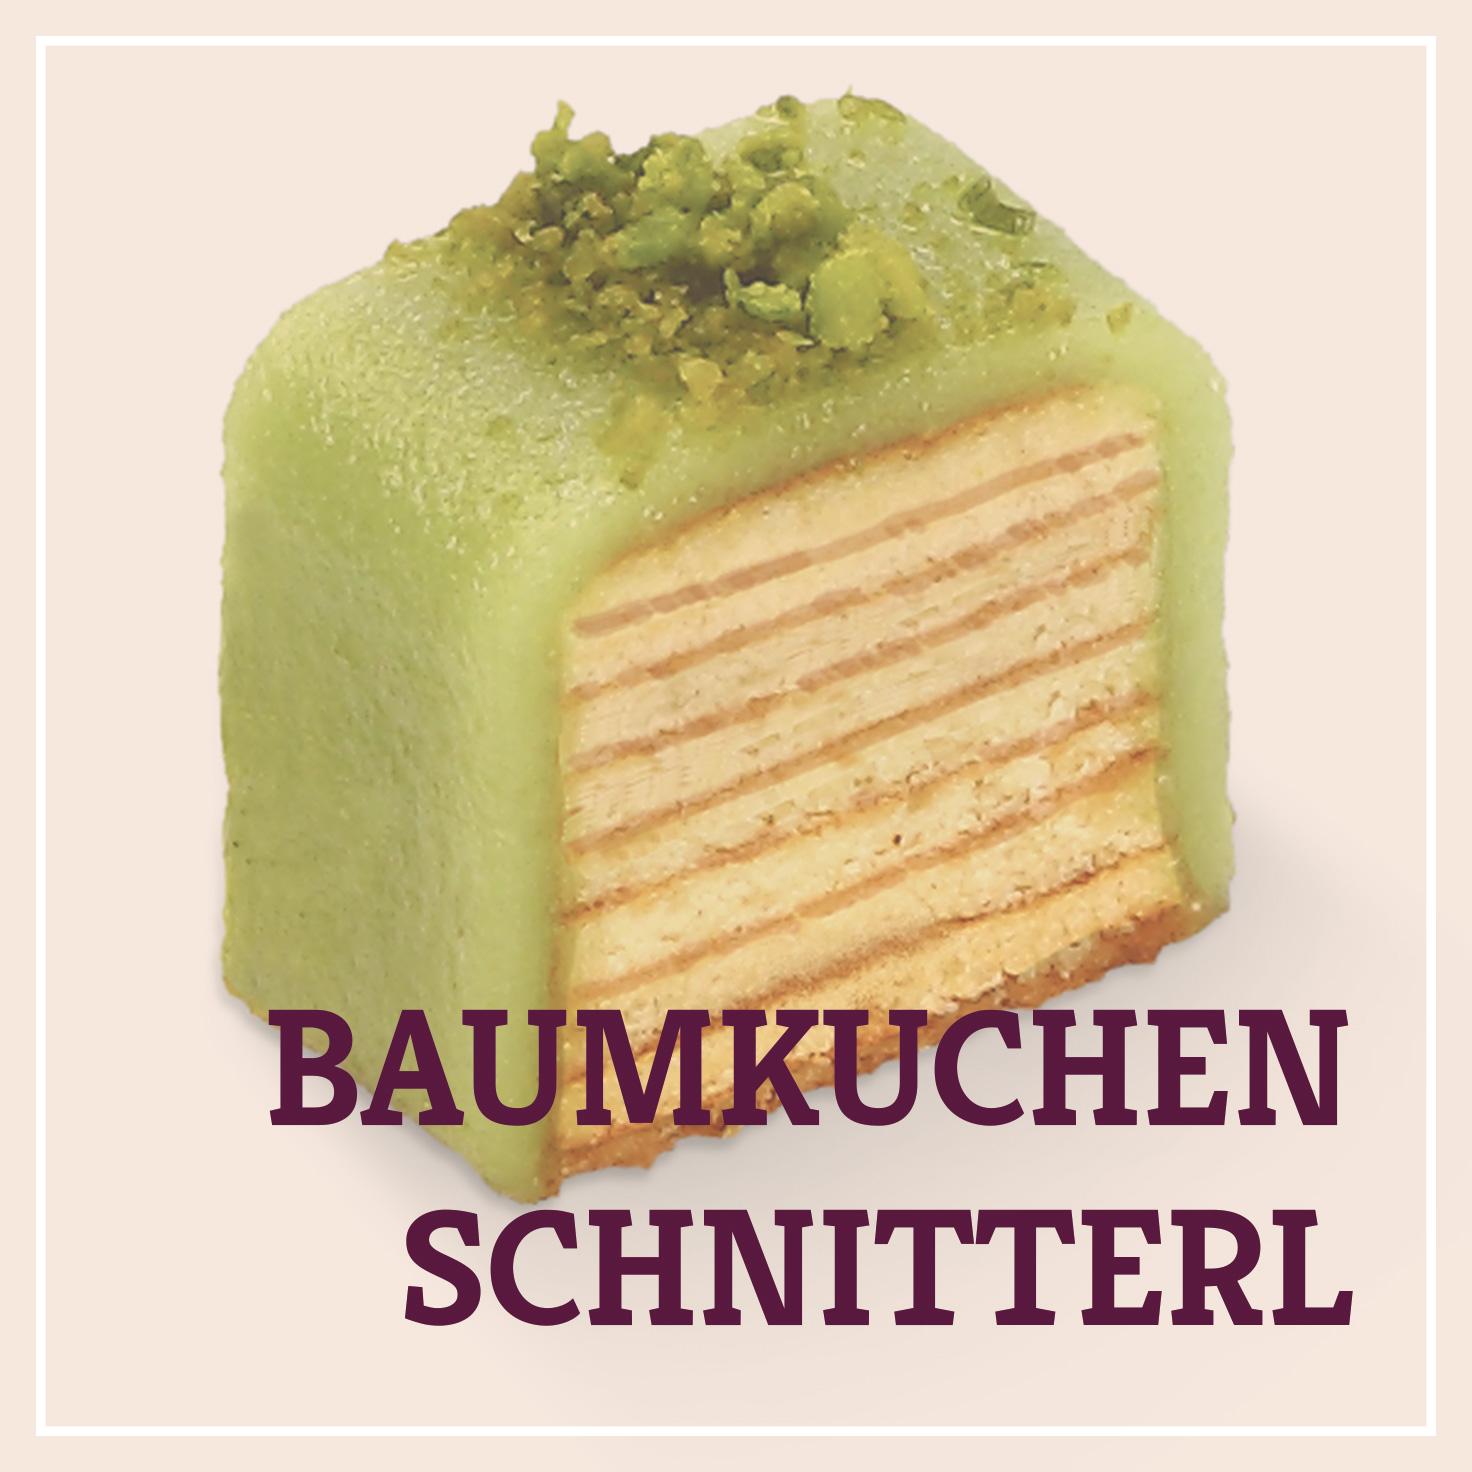 Heiss & Süß - Petit Fours - Baumkuchenschnitterl